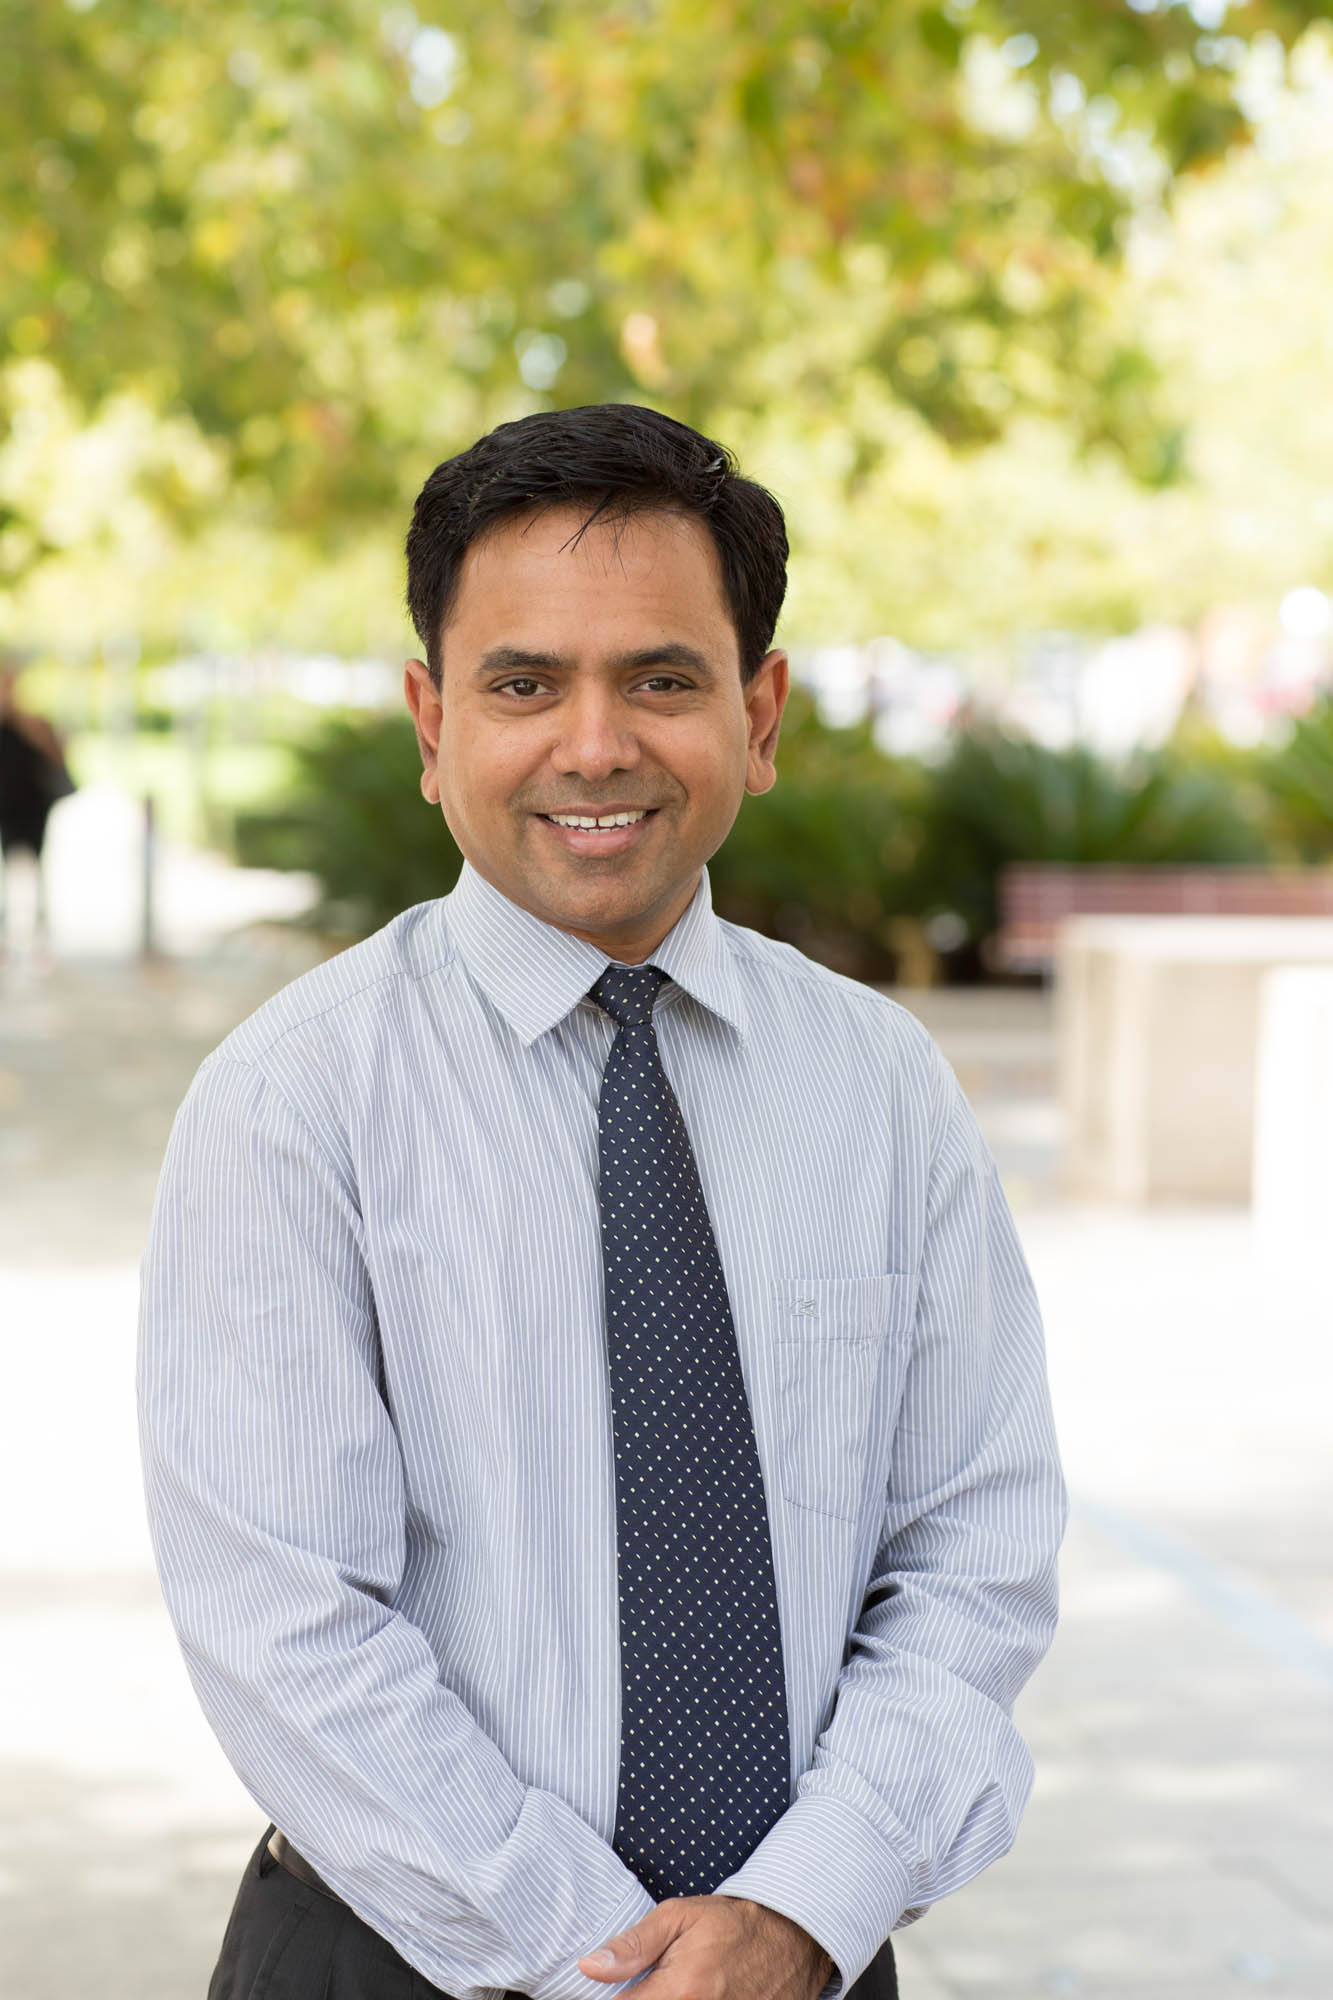 Dr Mahmud Al Masum